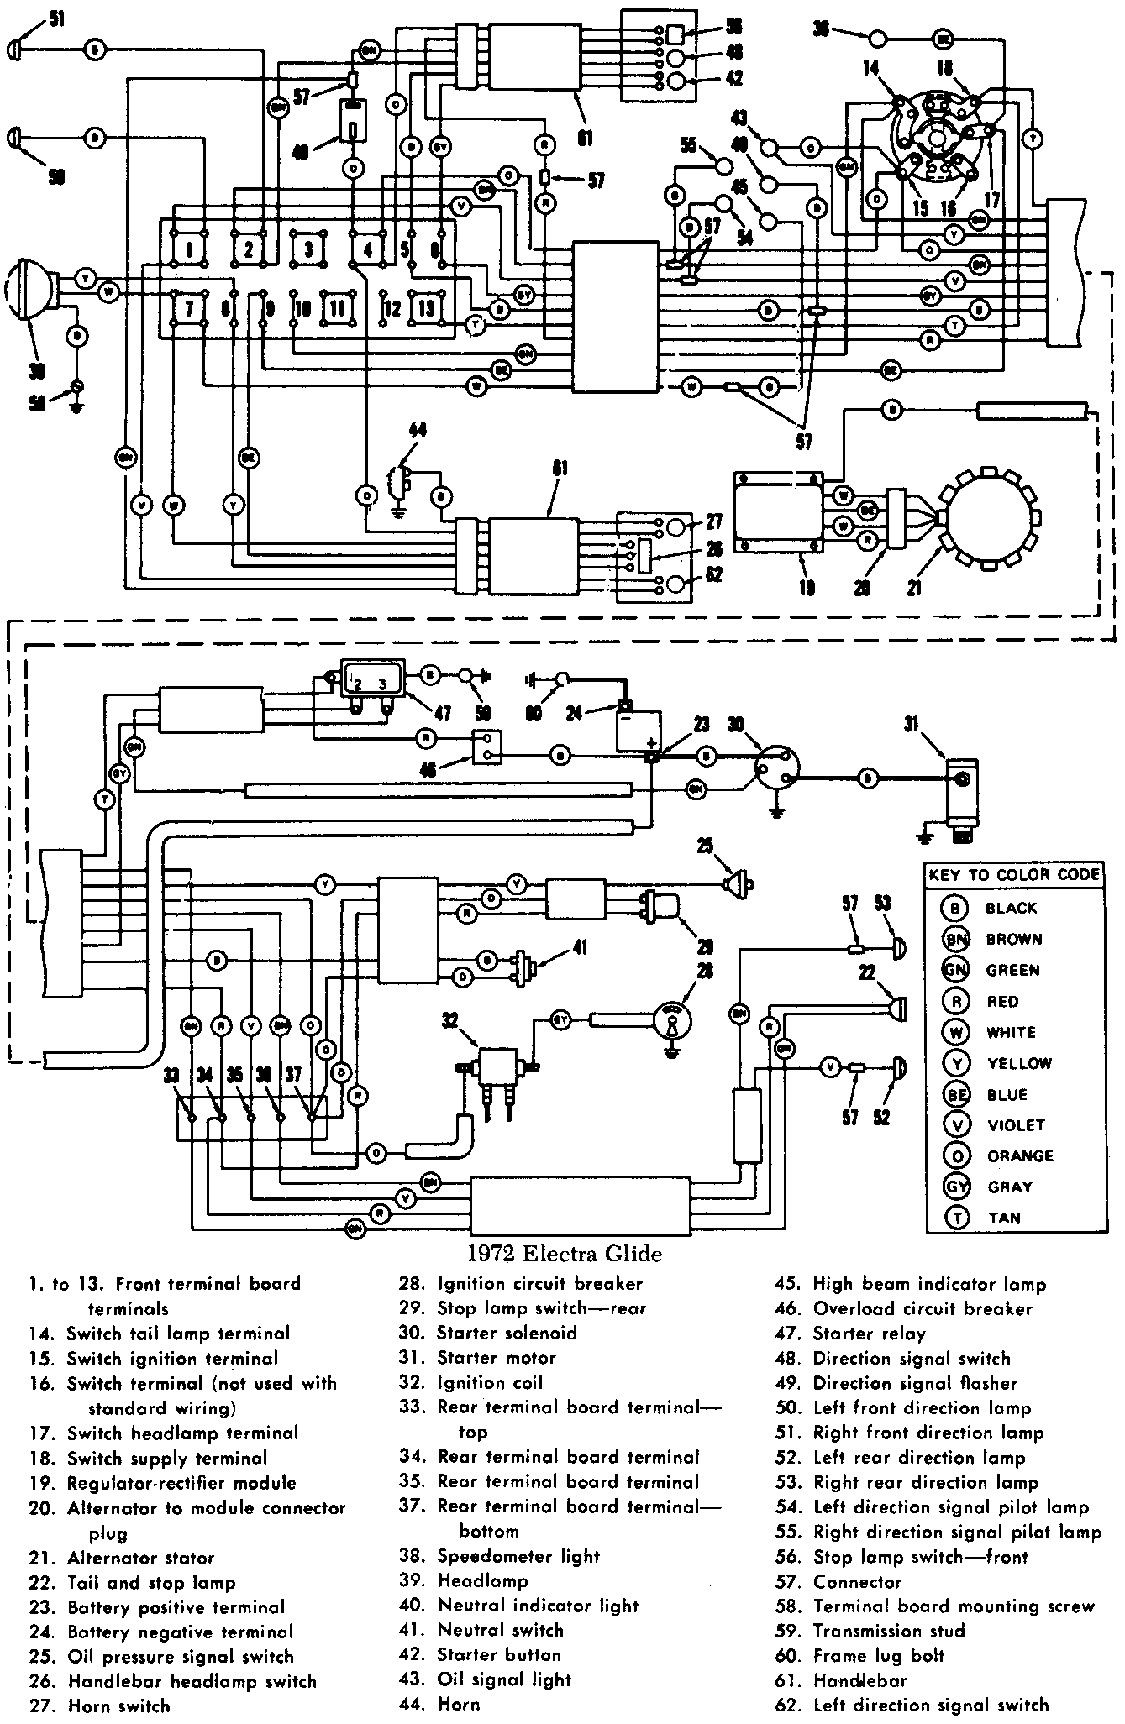 50 Free Harley Davidson Wiring Diagrams Ma4g I